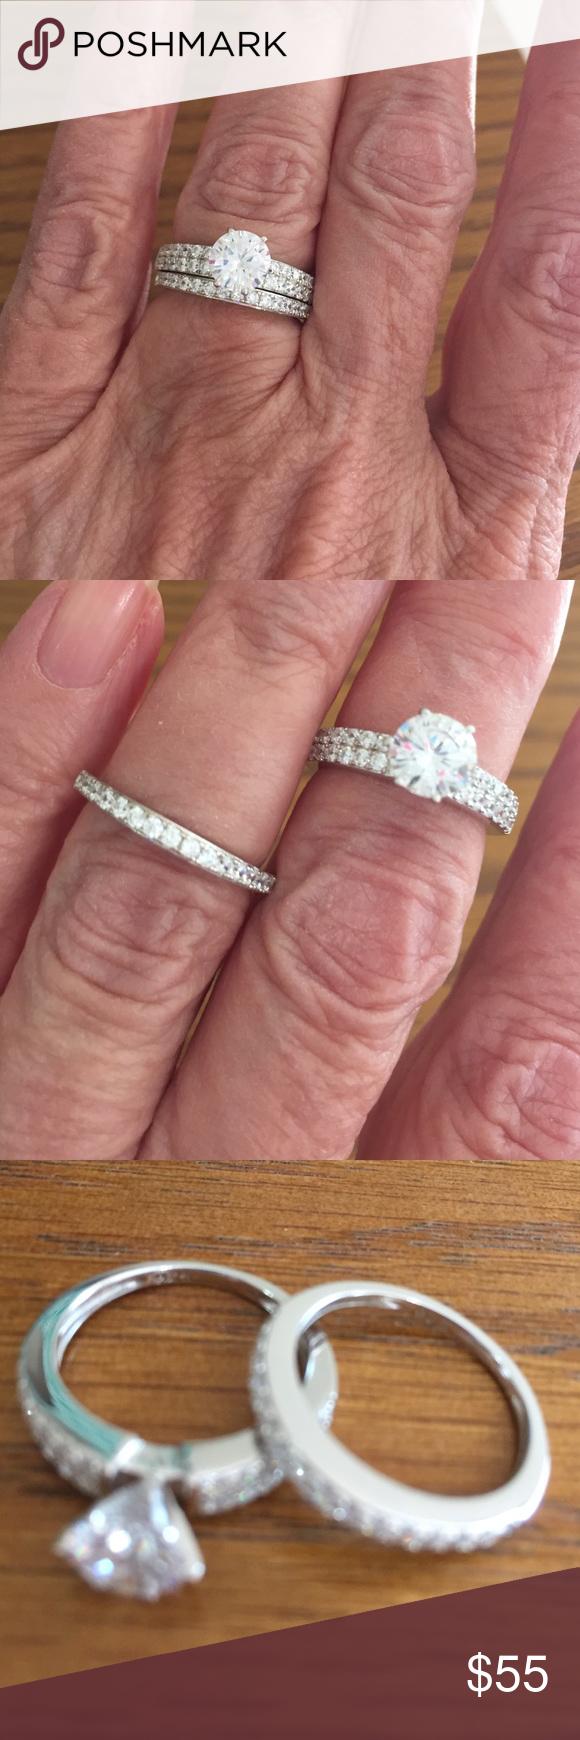 Beautiful simulated diamond wedding set   Wedding set, Retail and ...